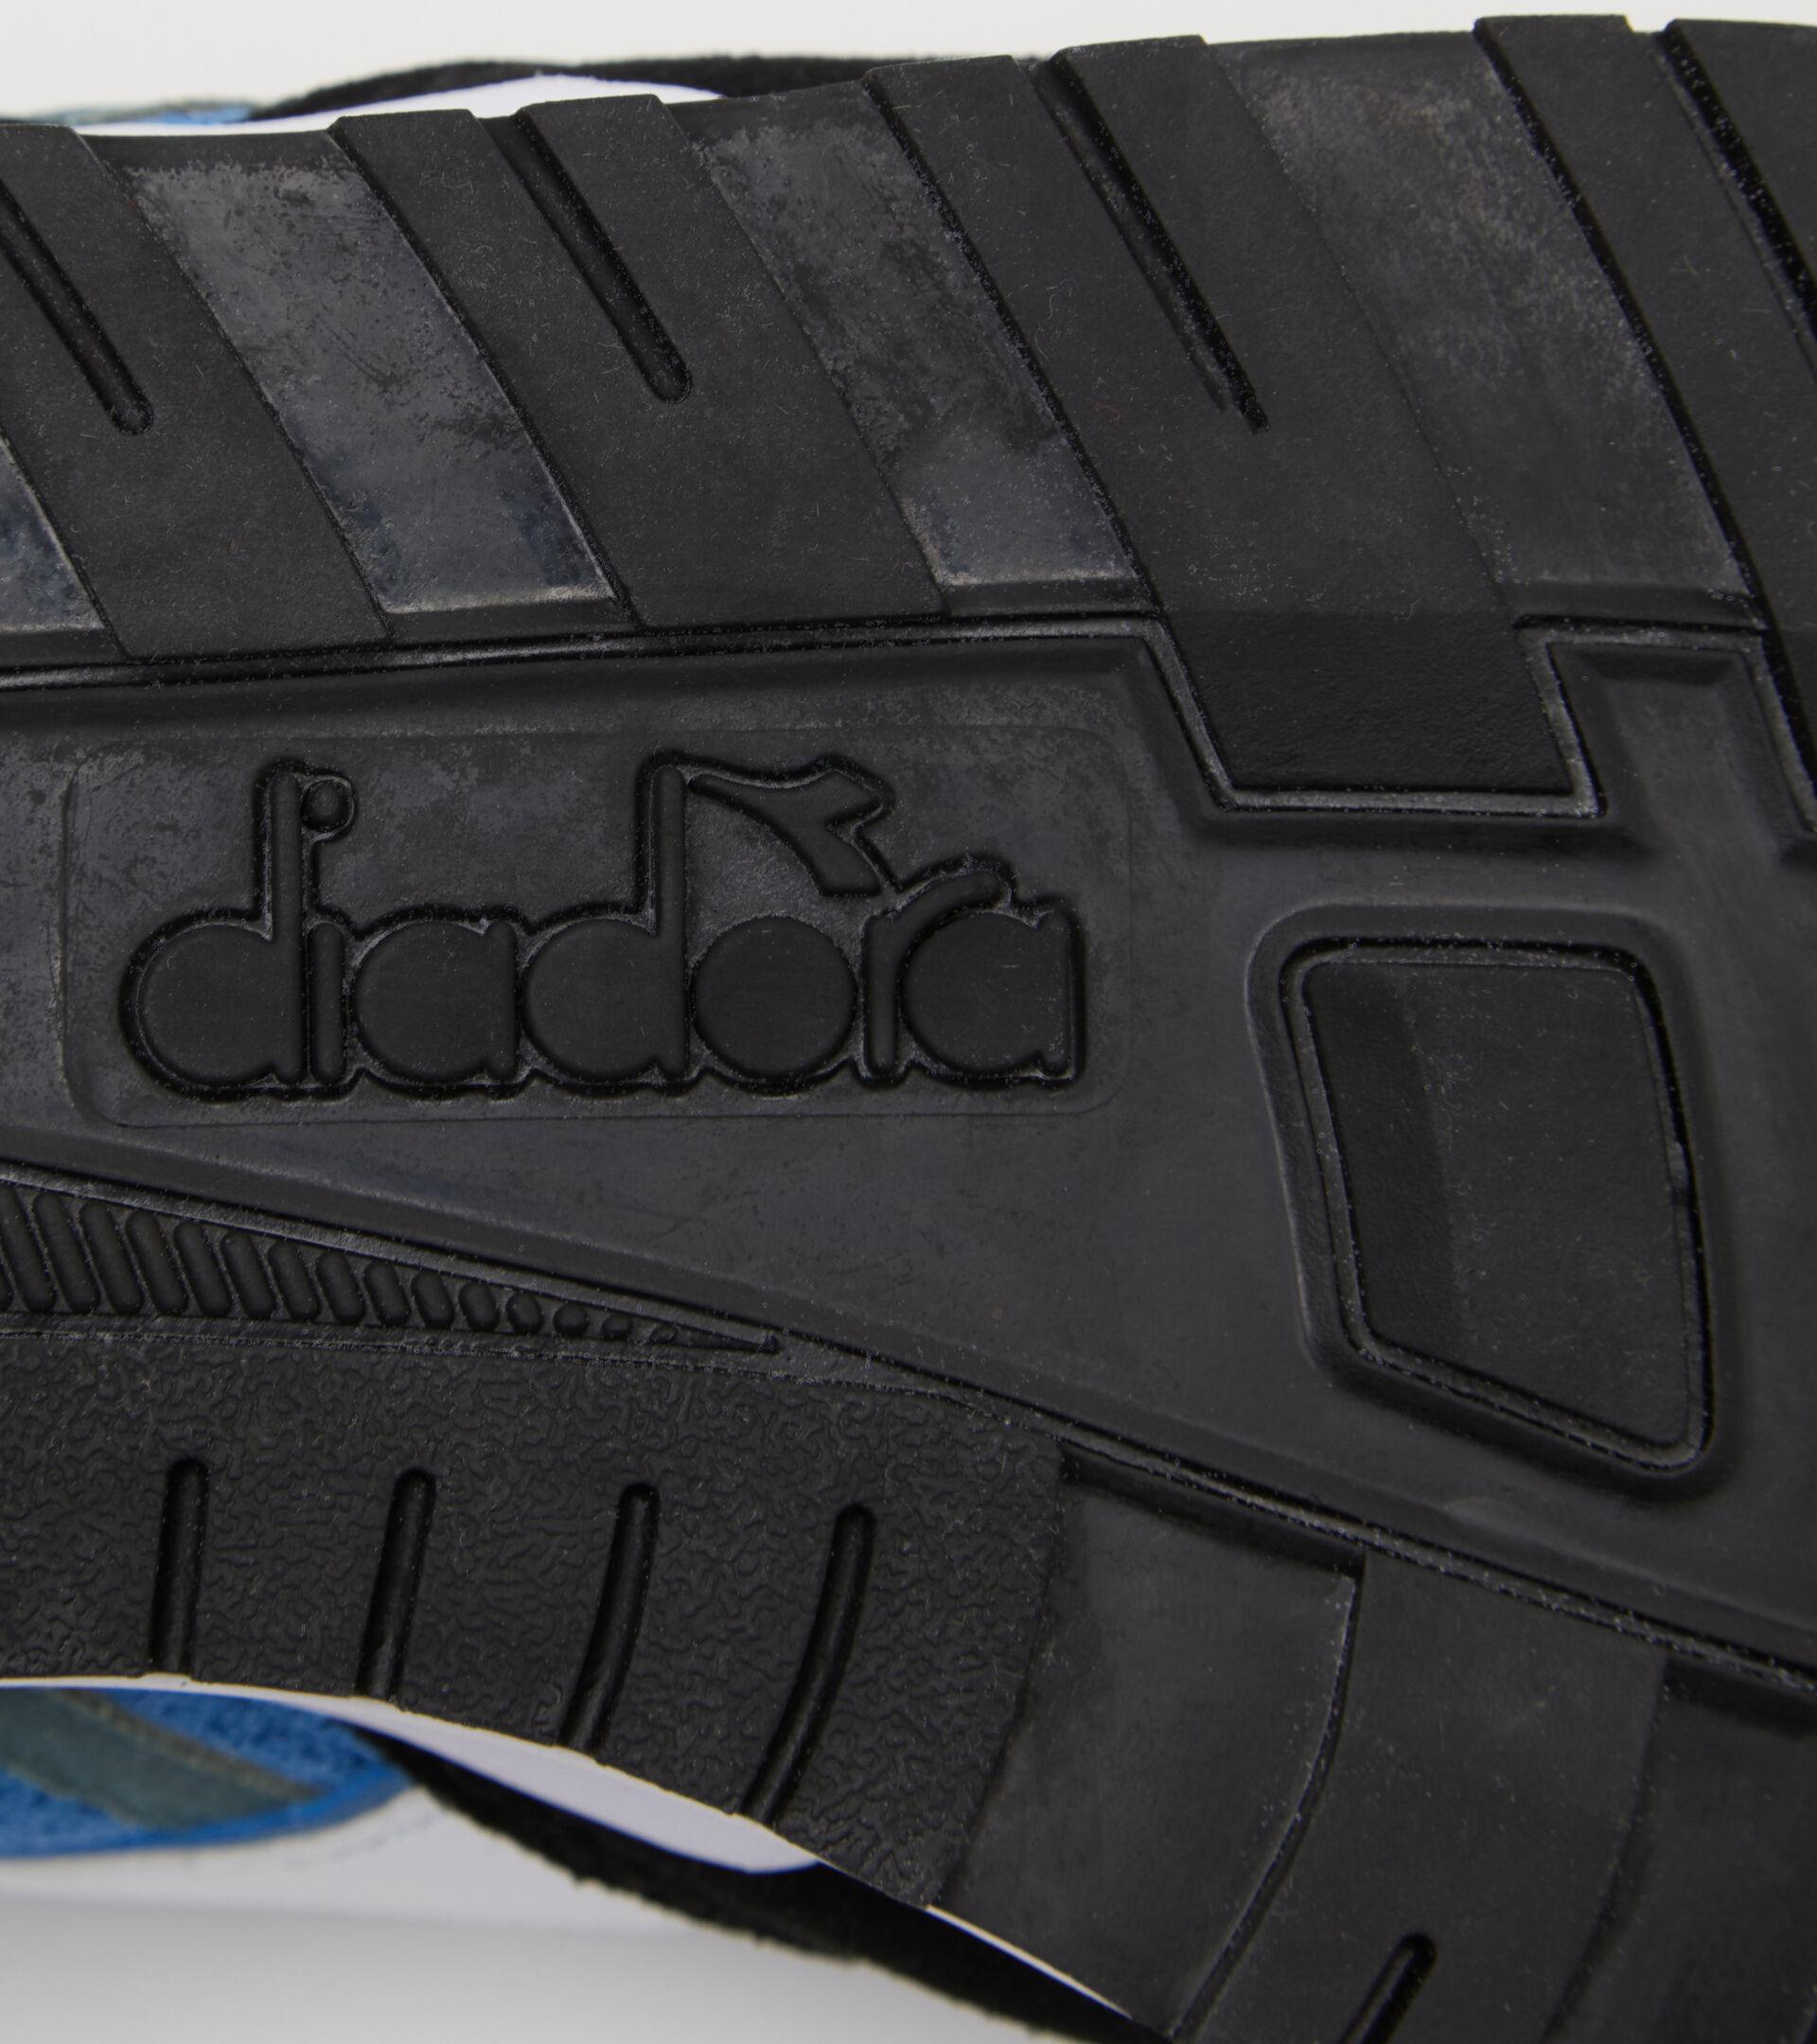 Zapatilla deportiva - Unisex N902 S AZUL VALLARTA/NEGRO - Diadora